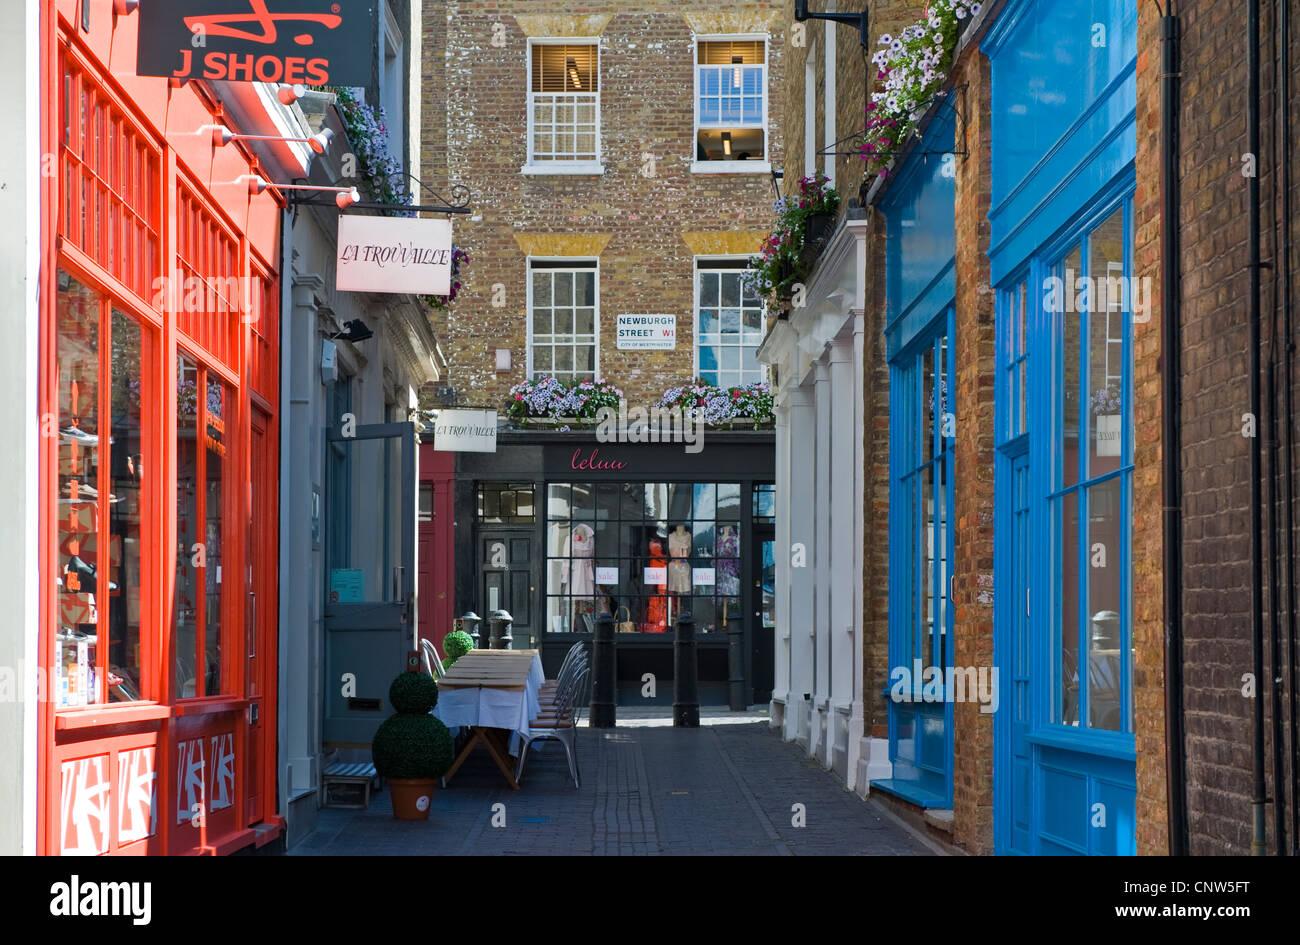 Europe England London, Carnaby street shops - Stock Image